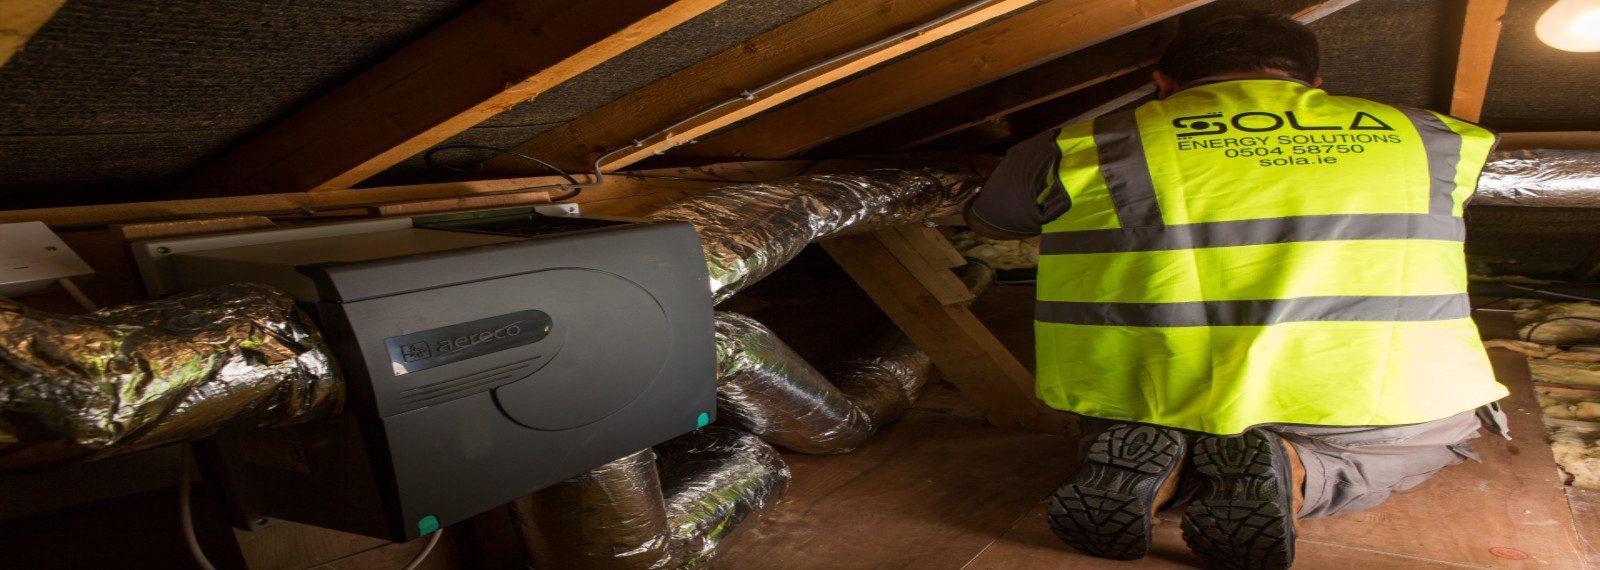 demand-controlled-ventilation